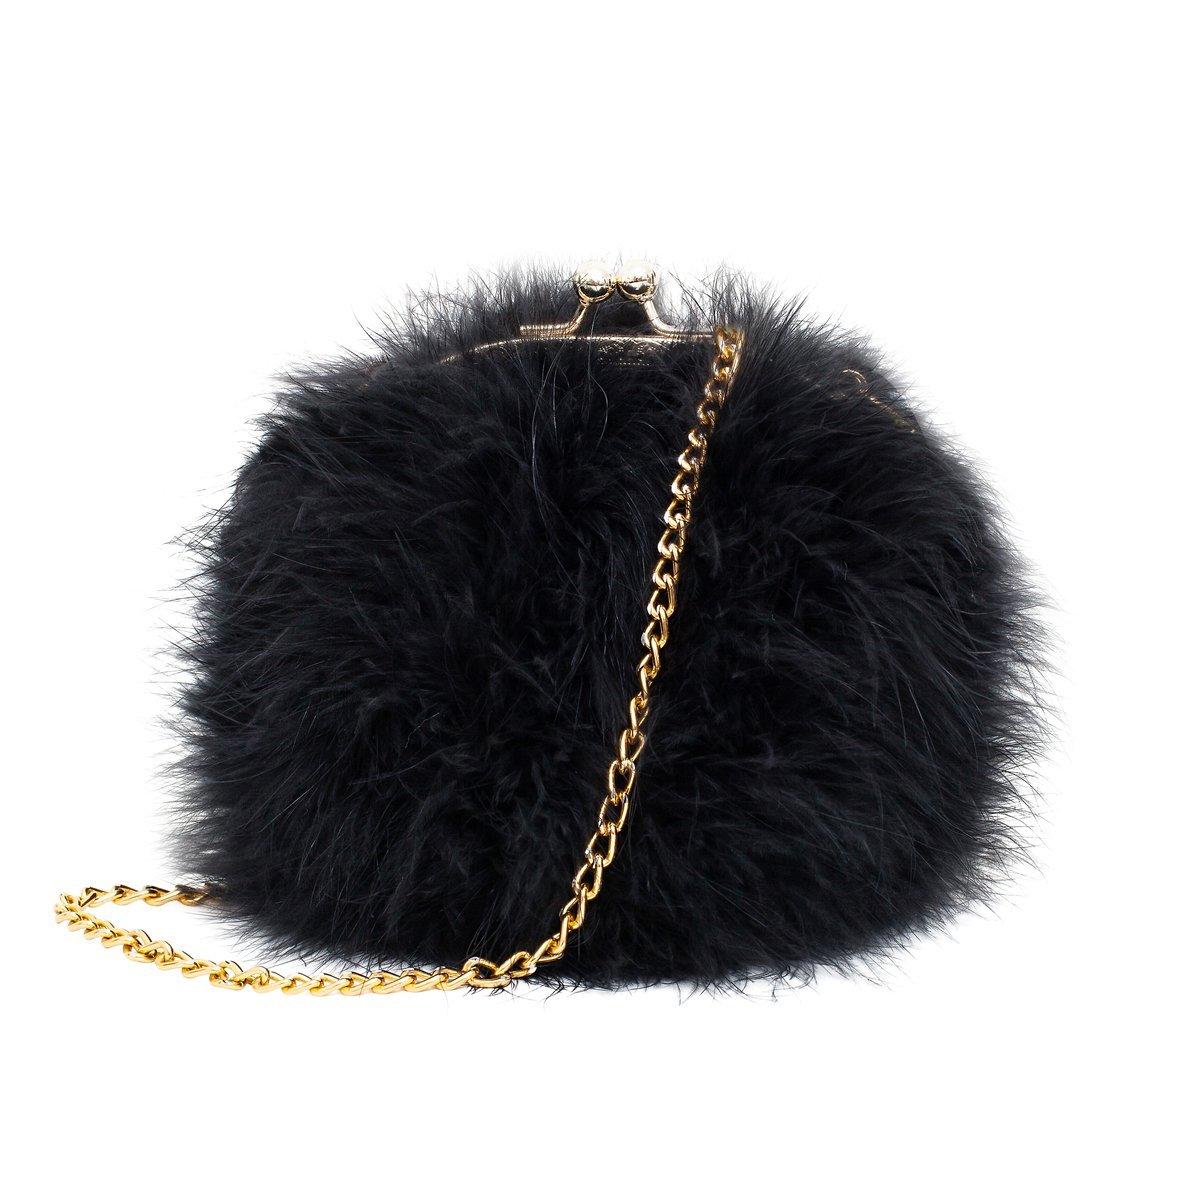 b73d7236a08 Mogor Women s Faux Fur Fluffy Feather Round Clutch Shoulder Bag Black   Handbags  Amazon.com